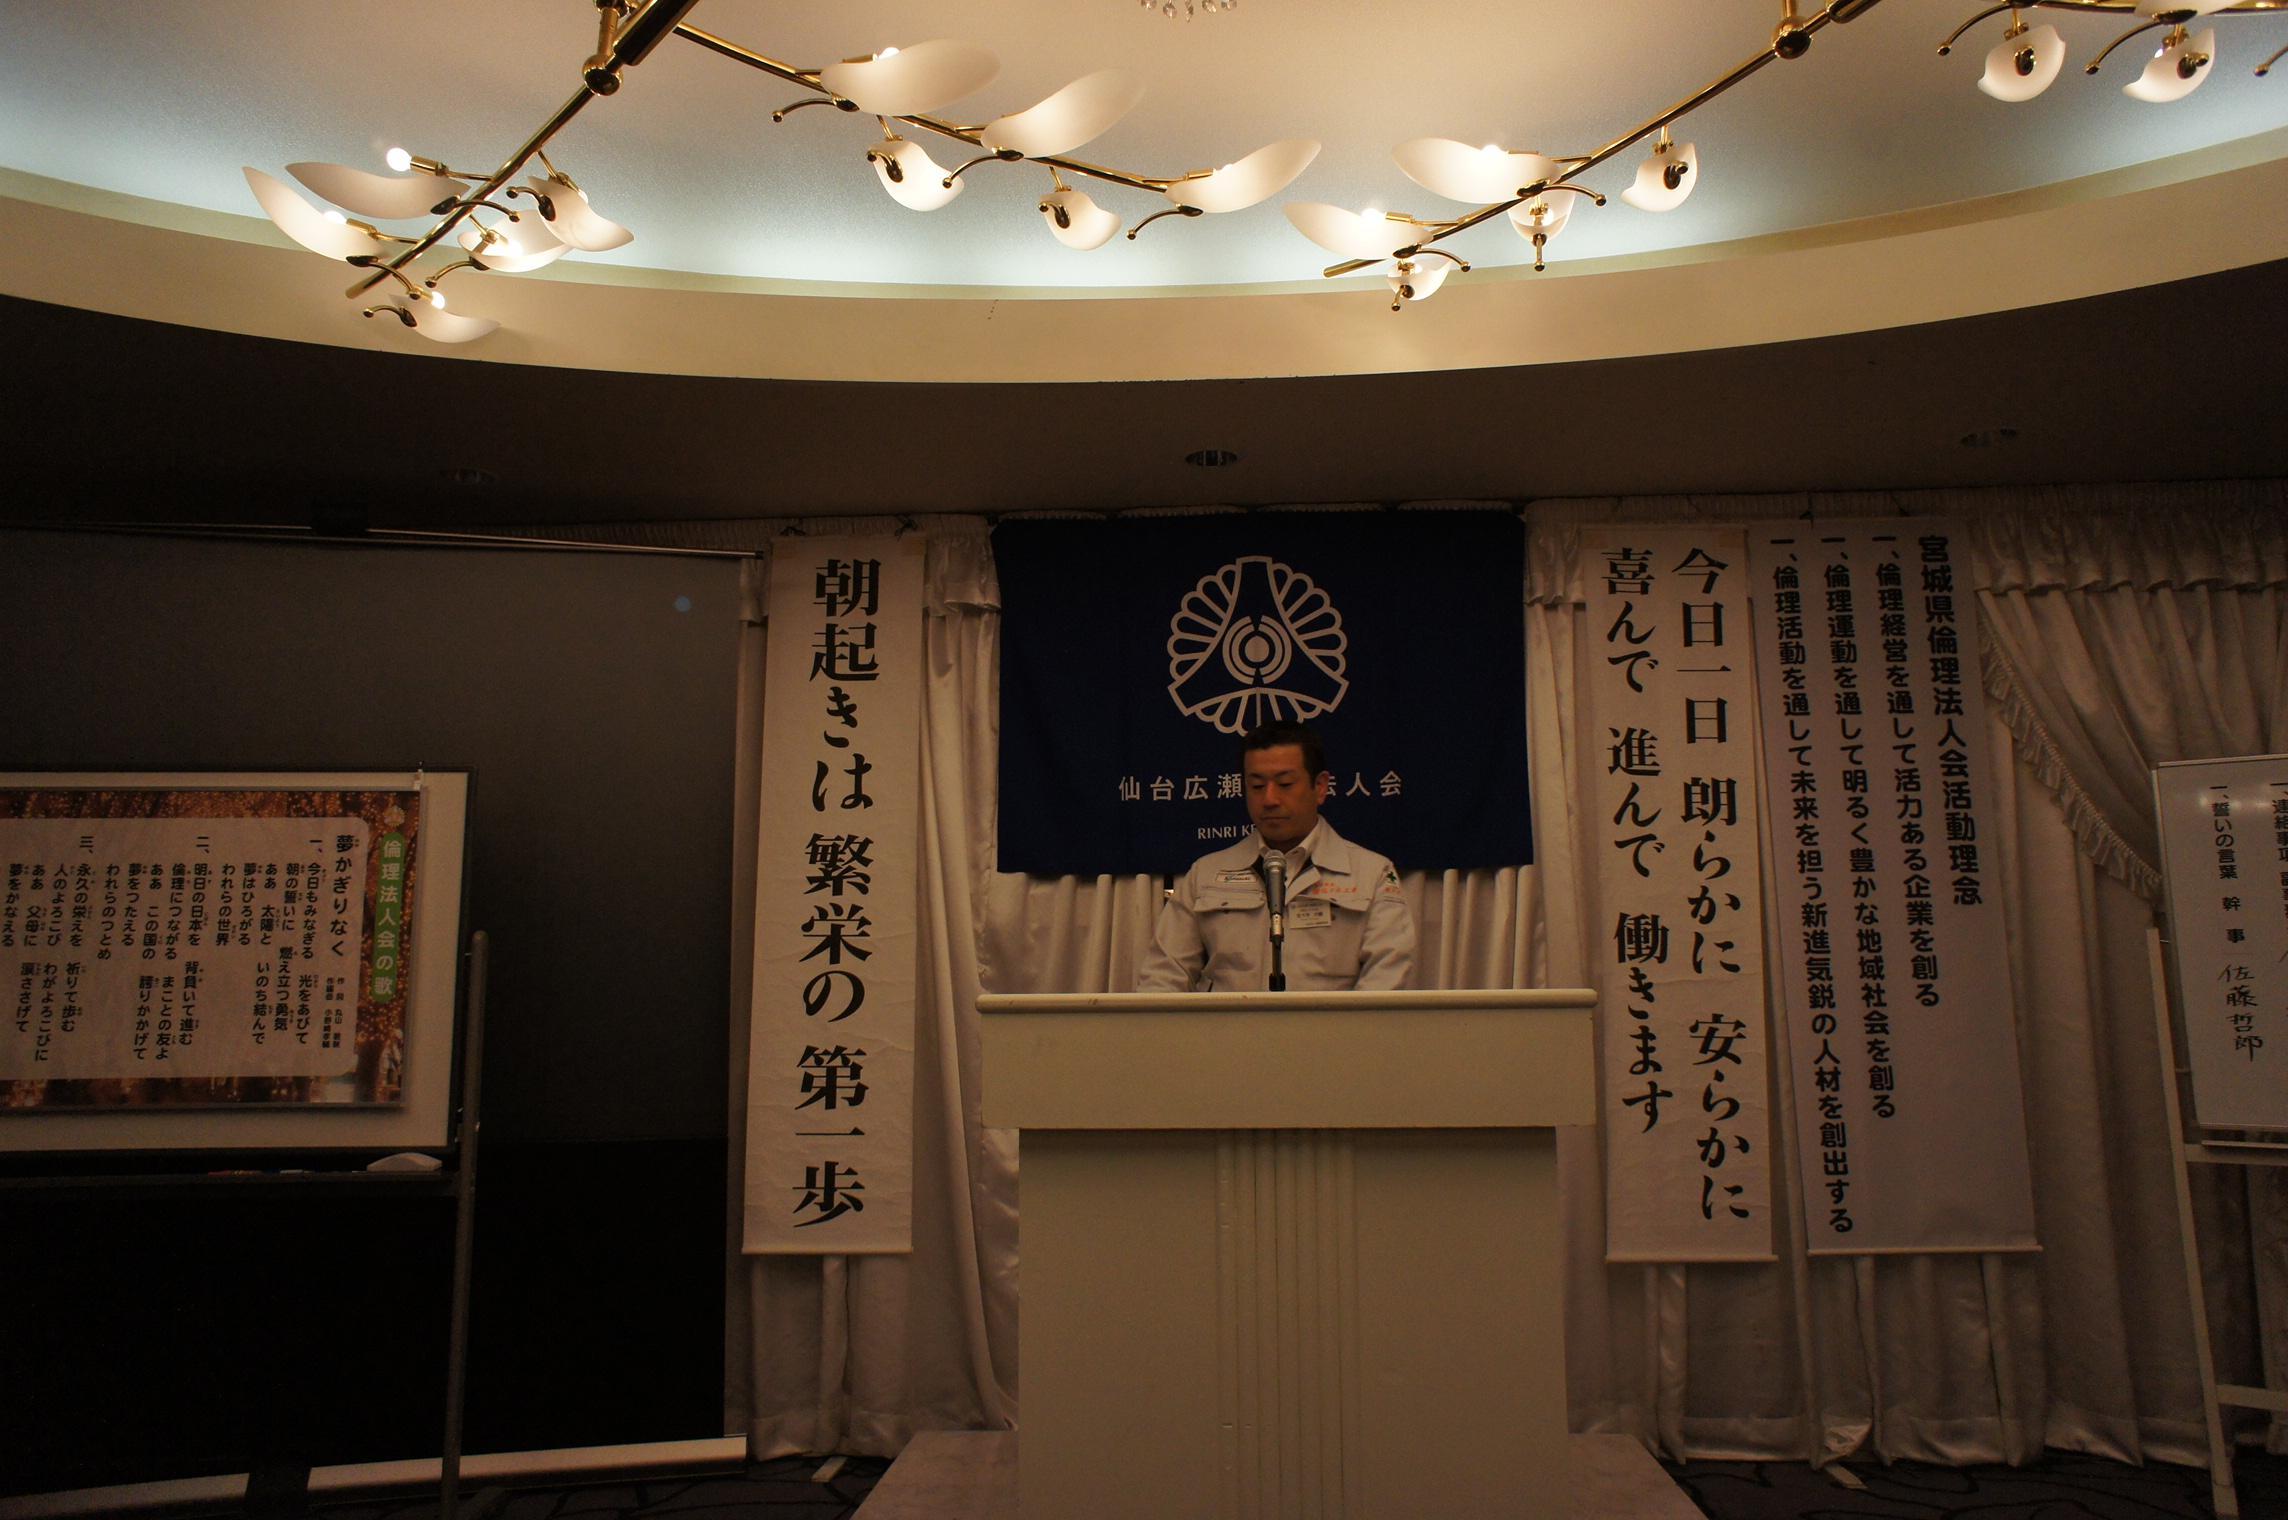 佐々木弘さん 新入会員 名札授与式